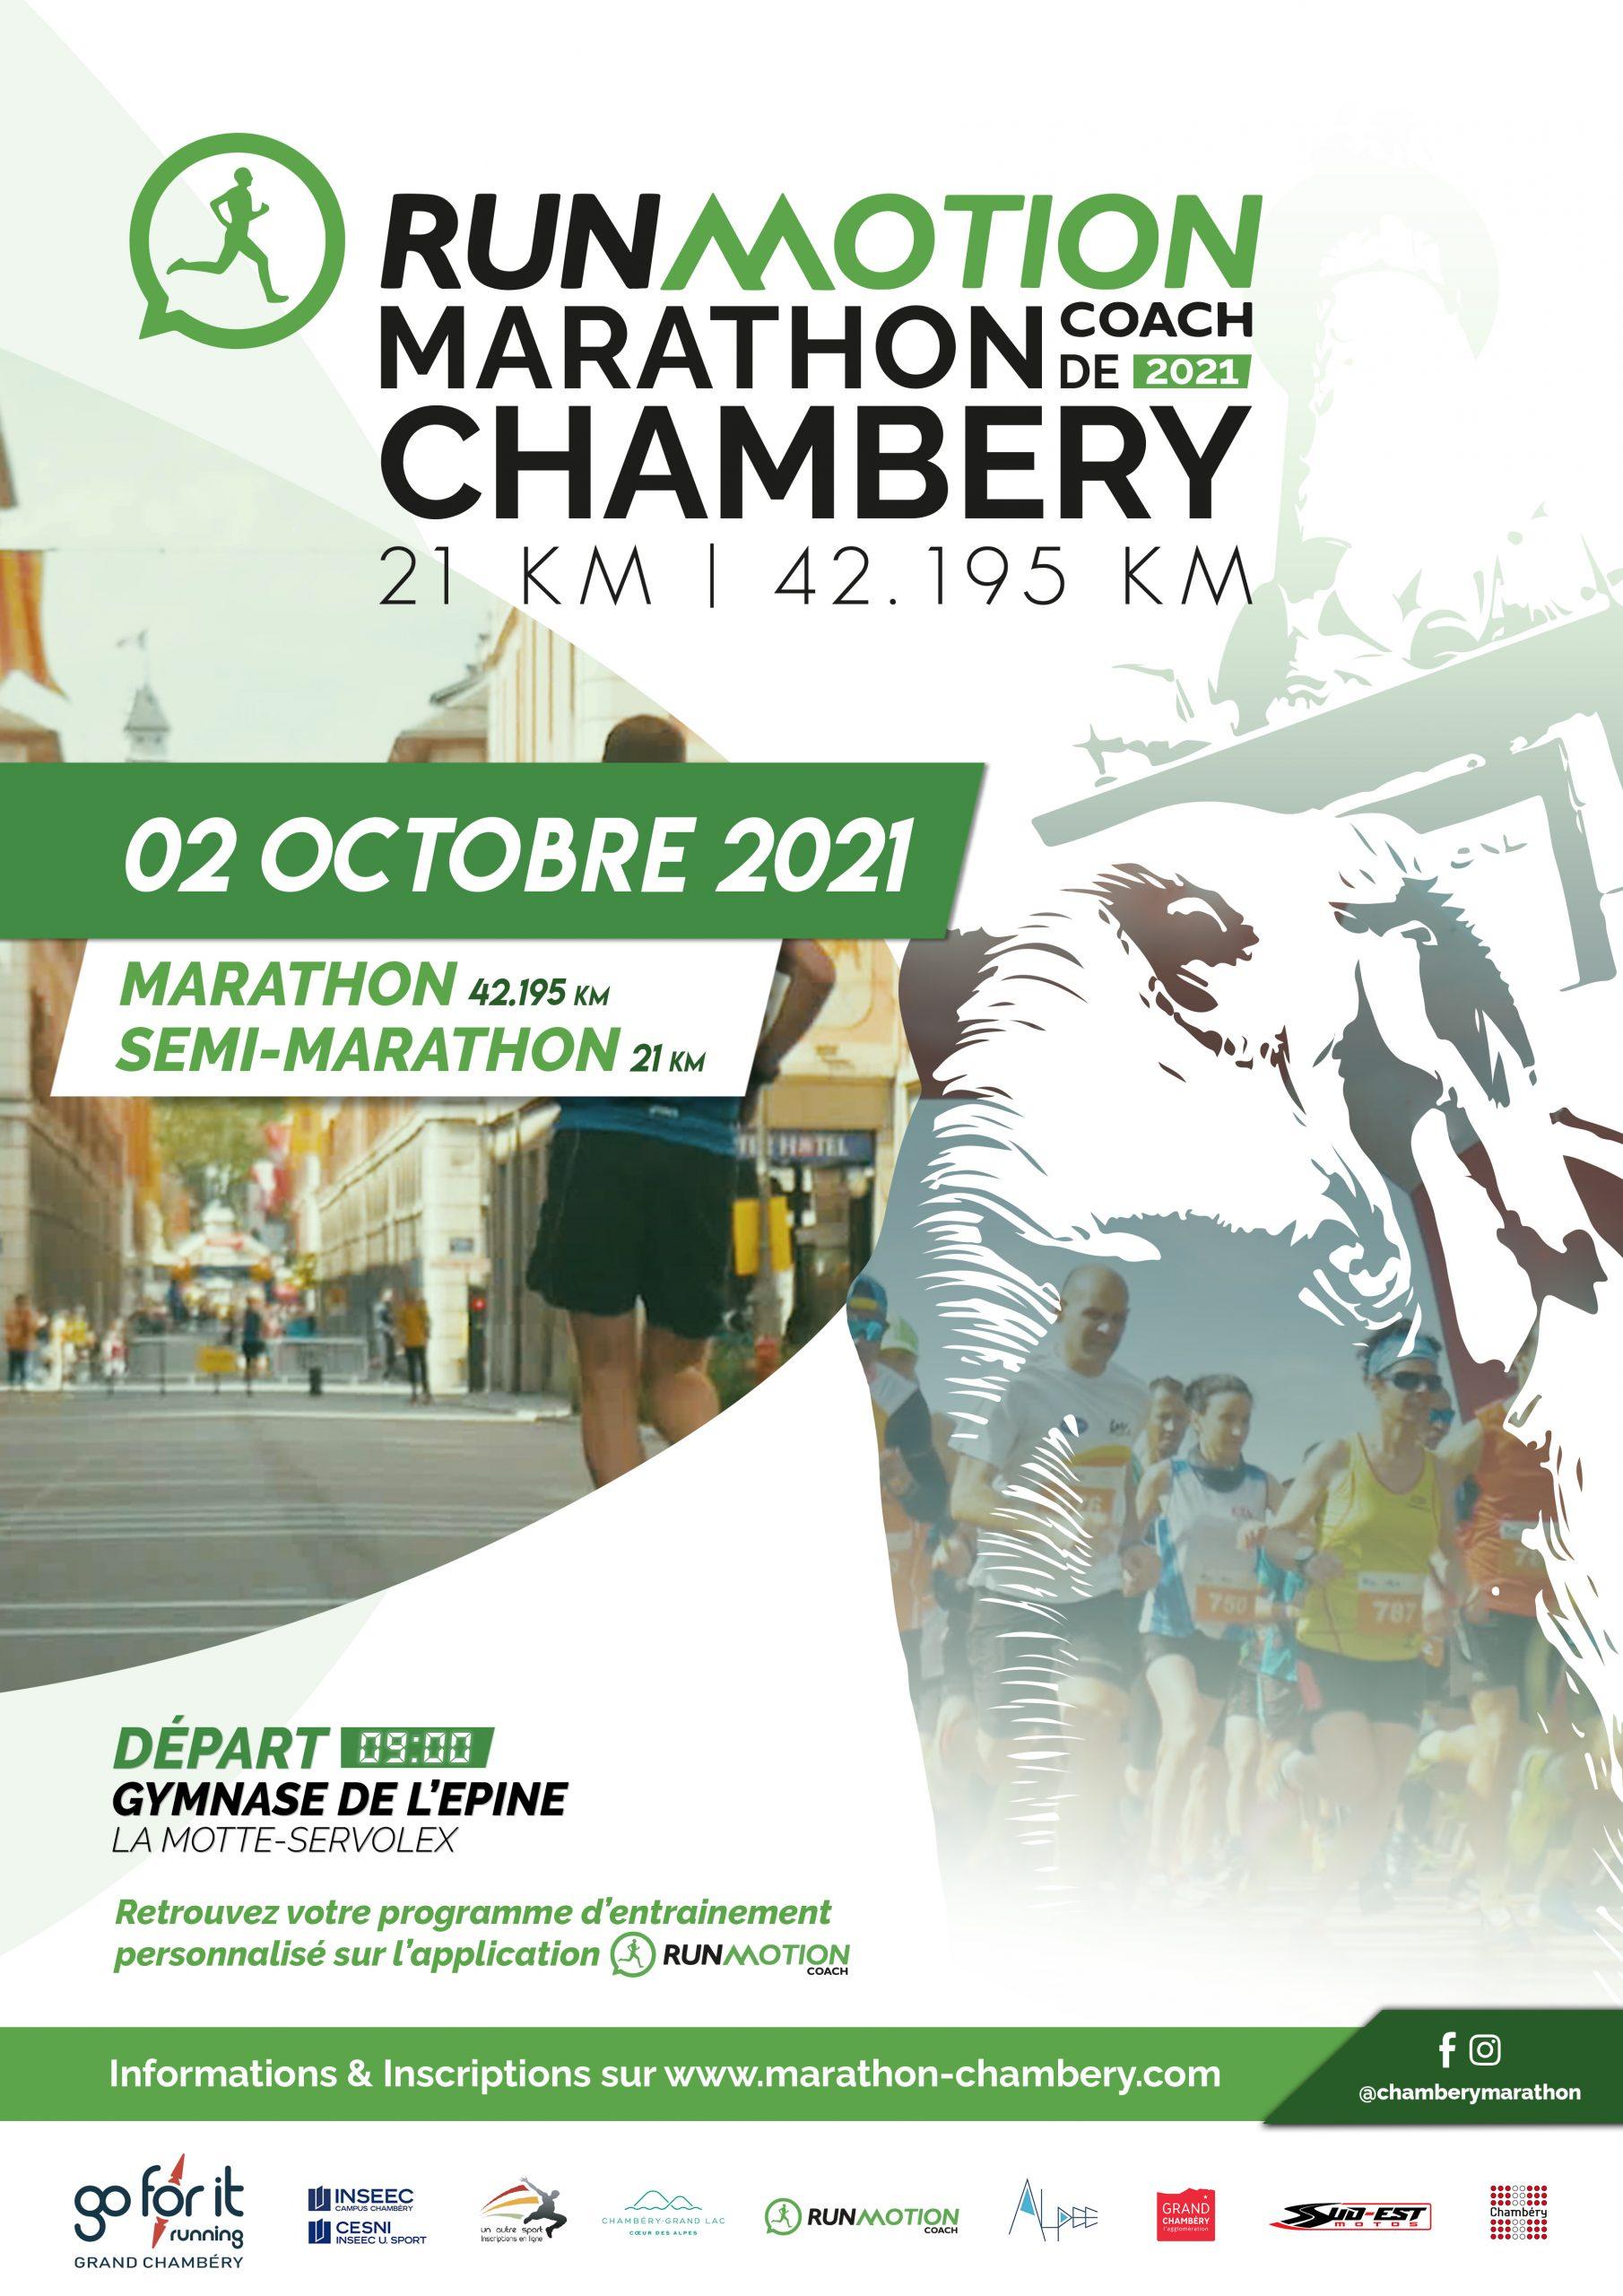 Run Motion Coach Marathon de Chambéry – 2 Octobre